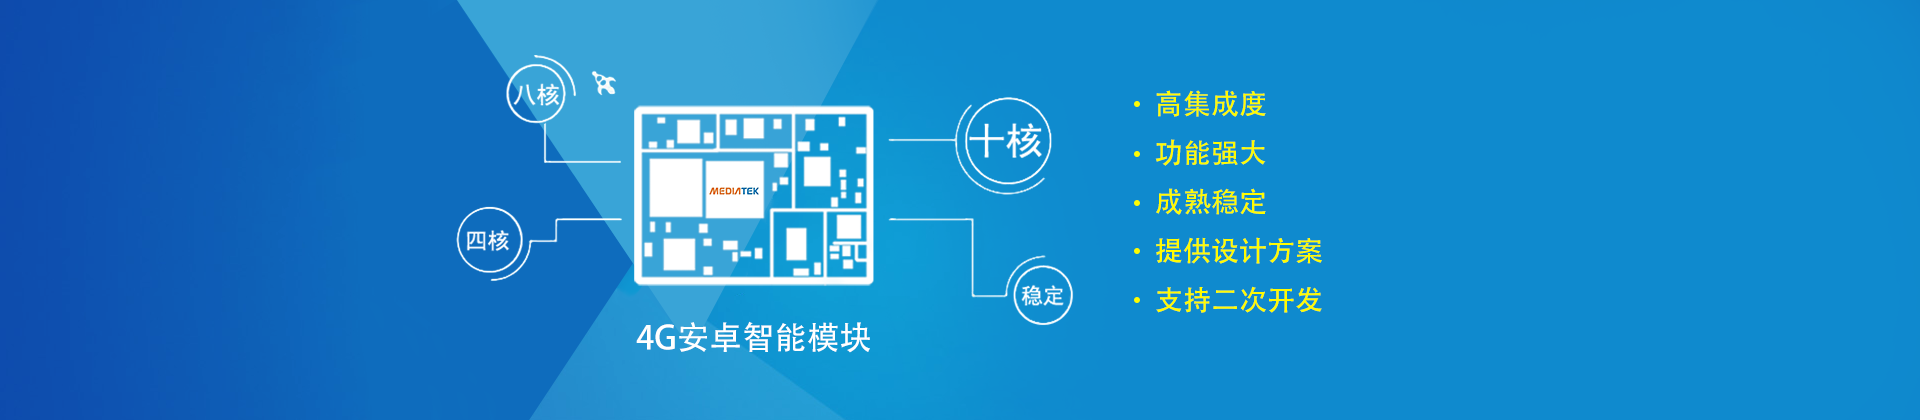 bobgame核心板,4Gbobgame智能模块